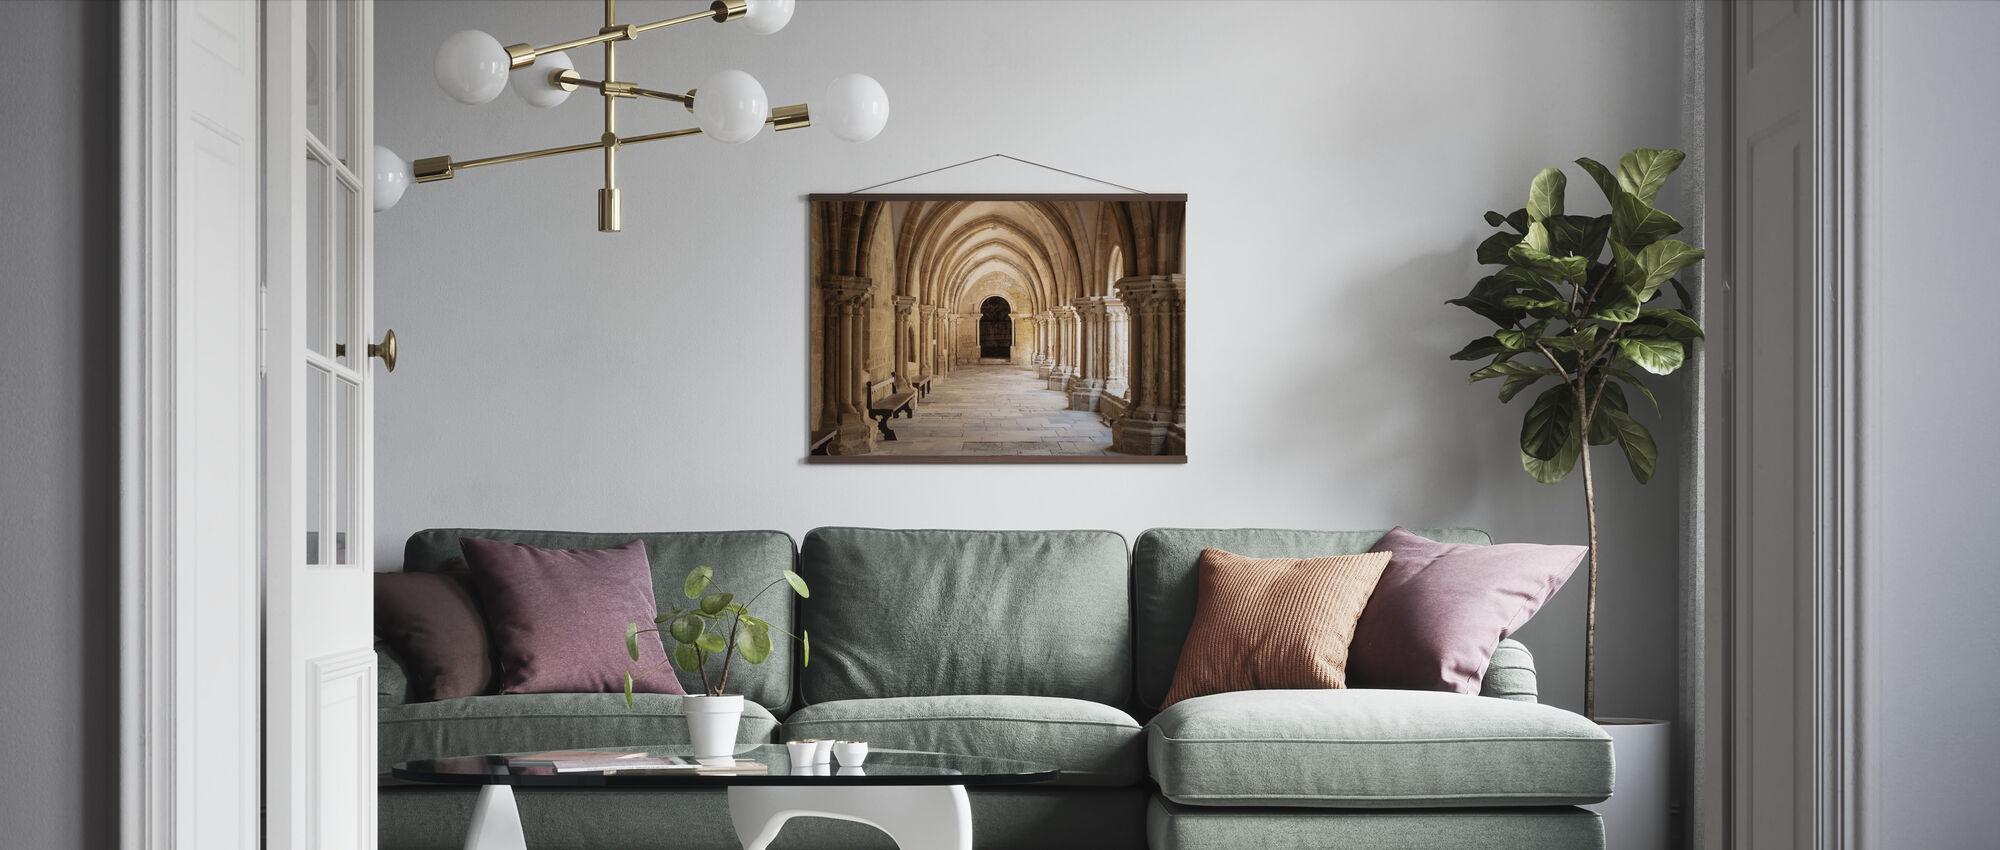 Hallway - Poster - Living Room